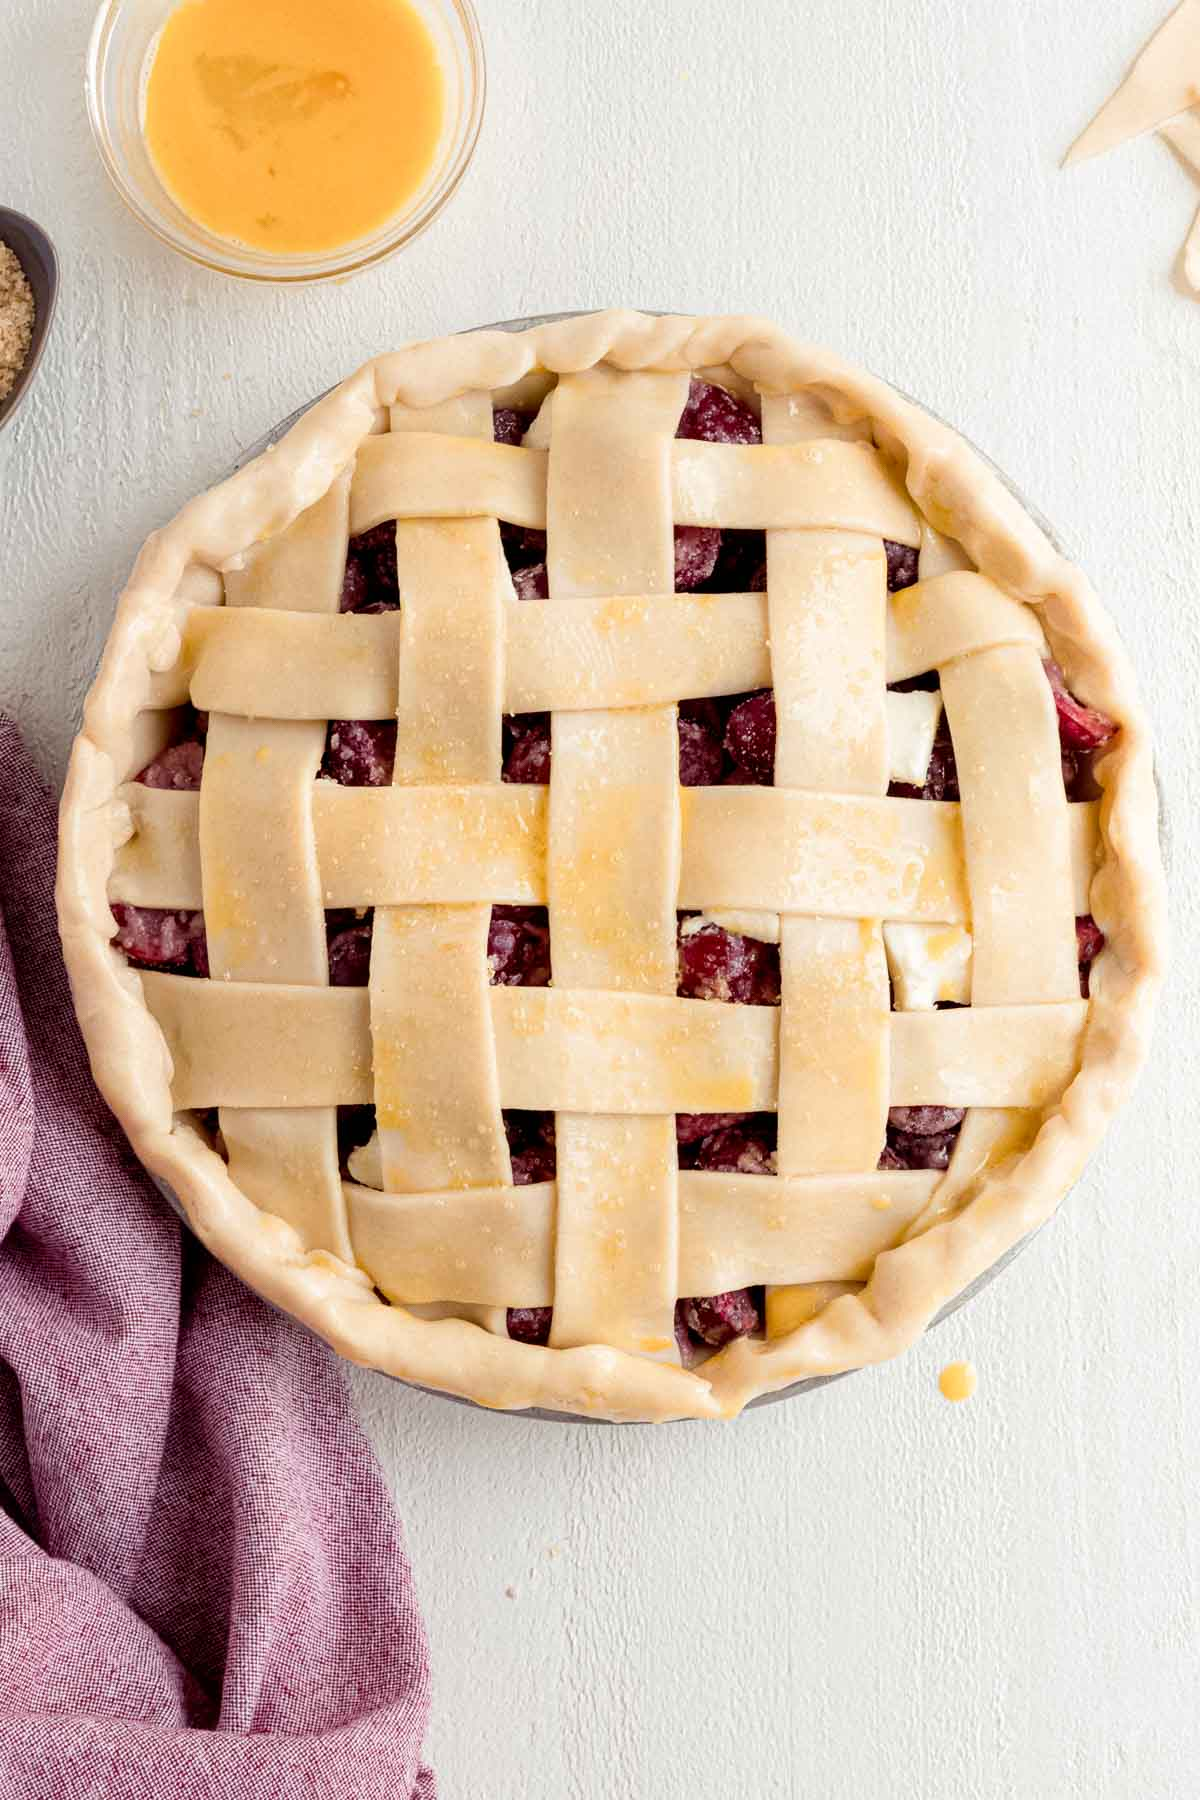 Cherry Pie with lattice crust before baking